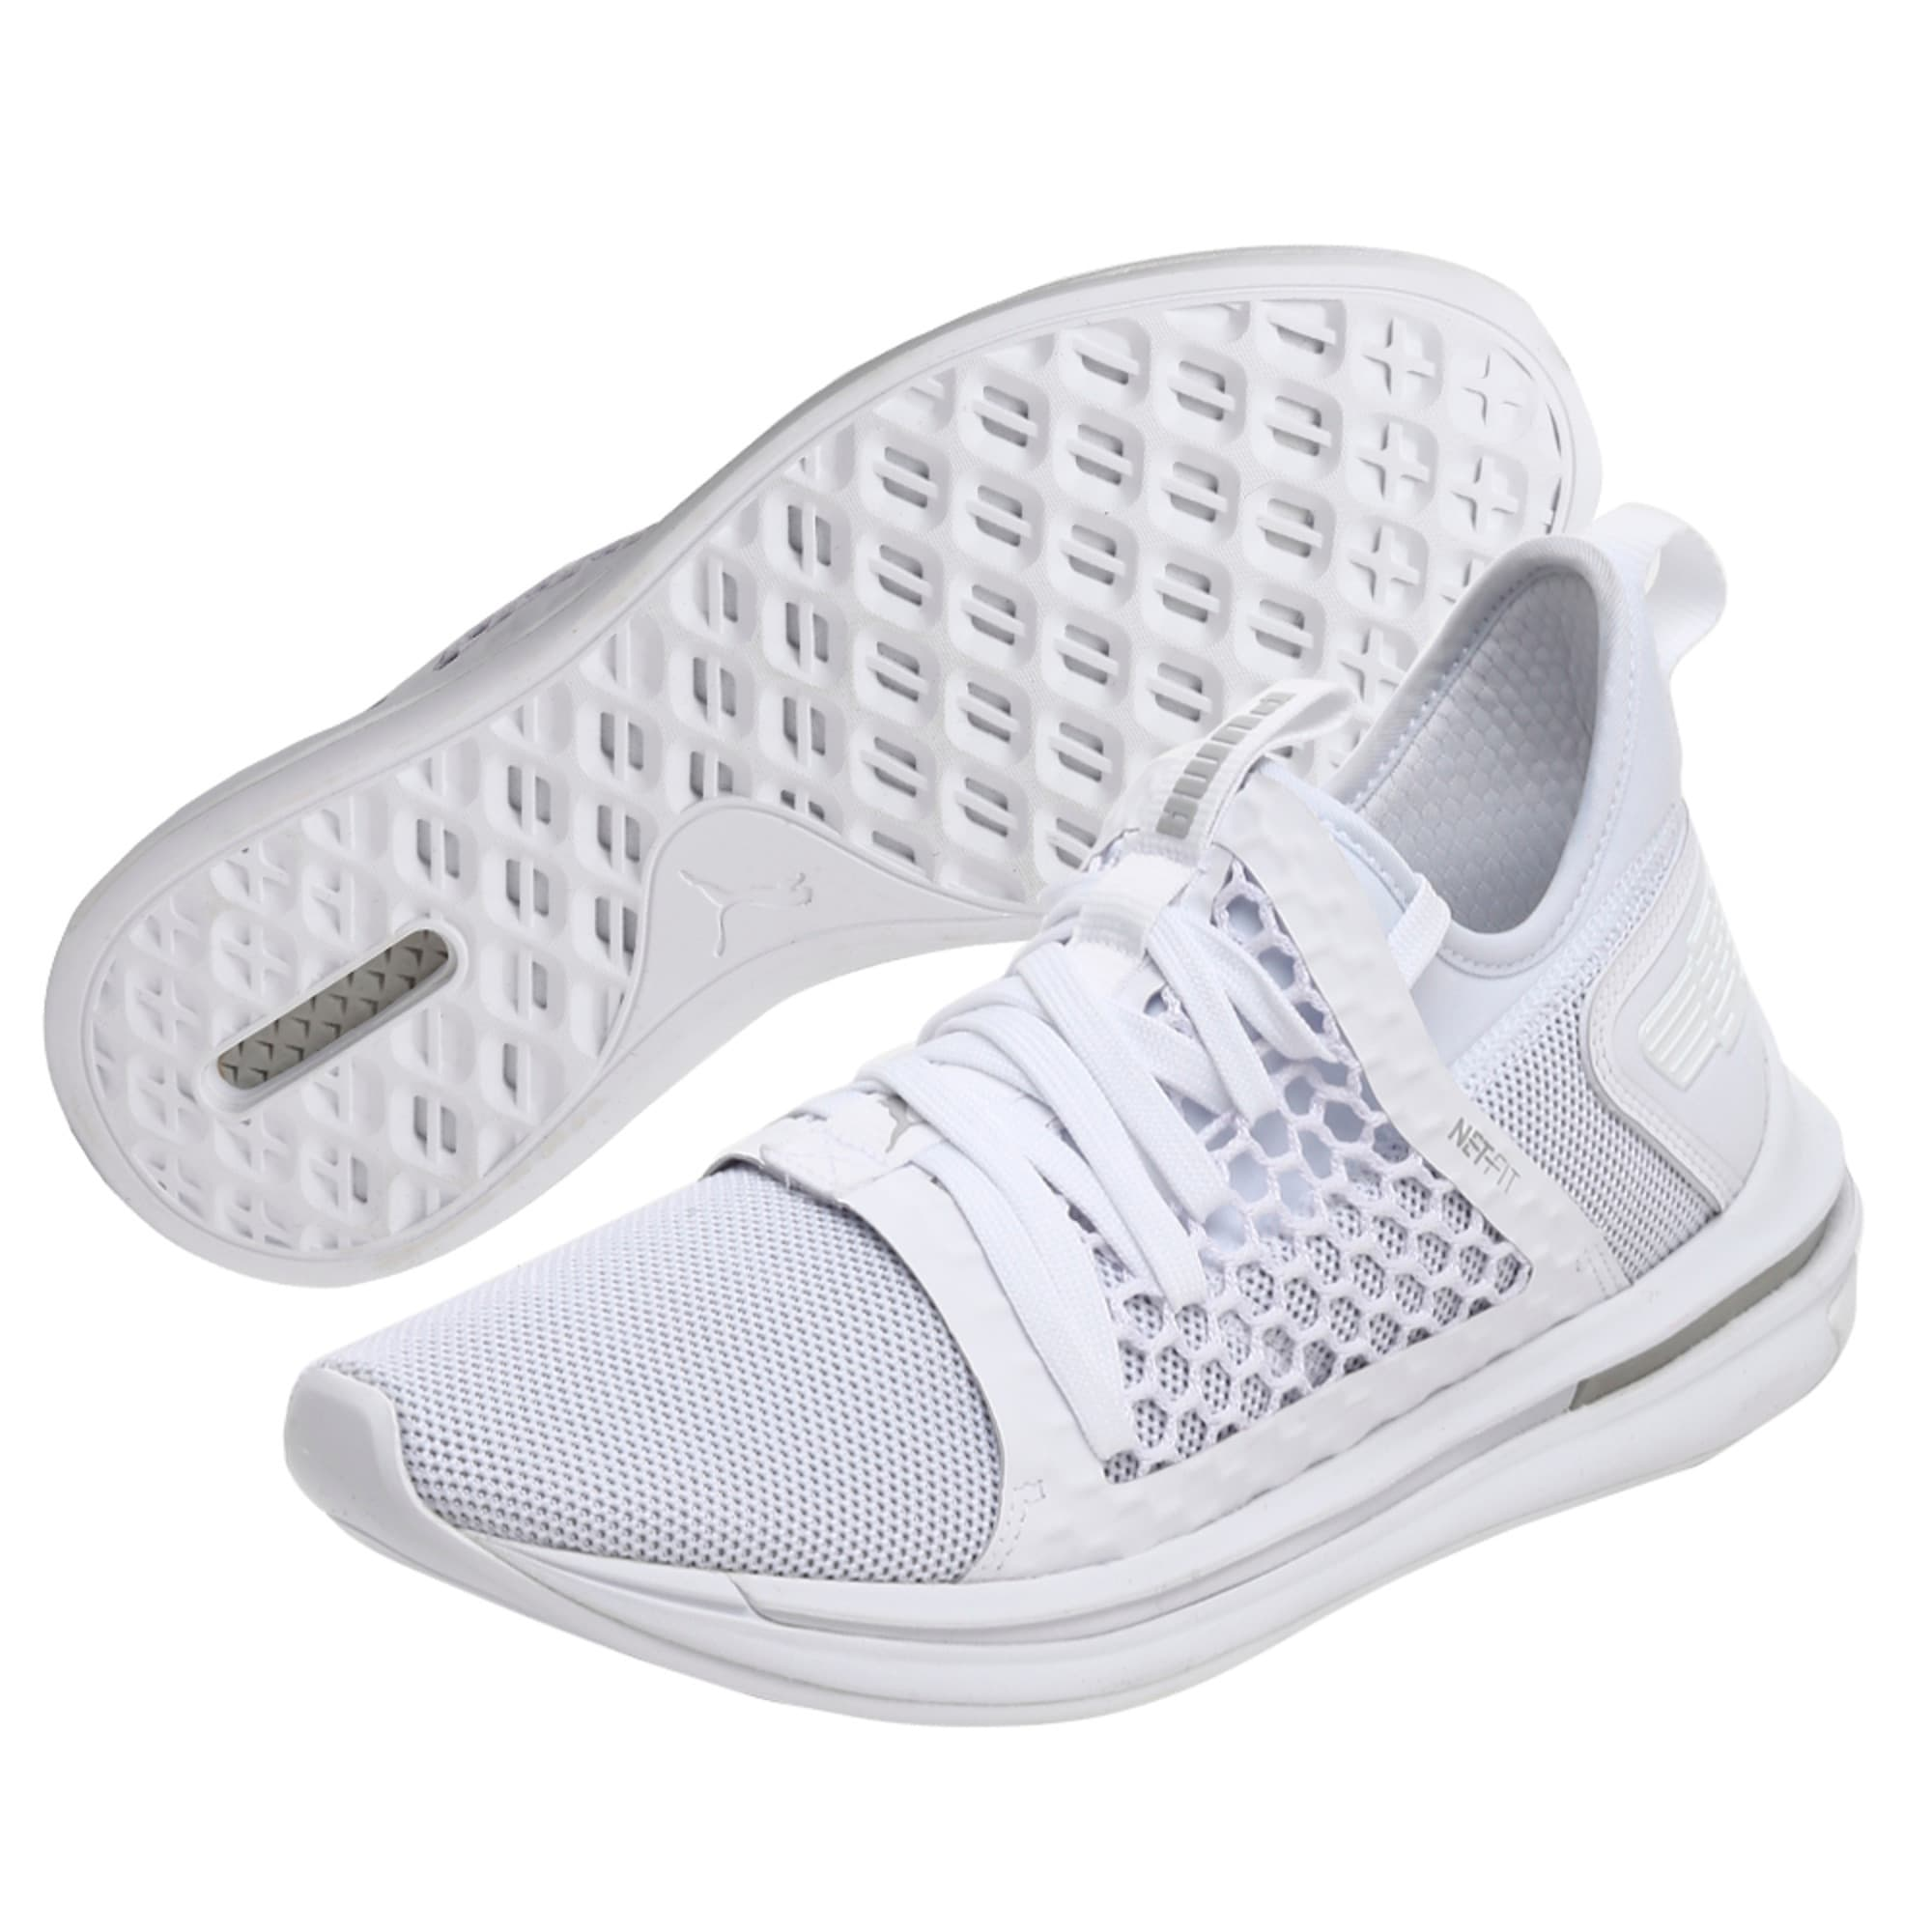 Thumbnail 1 of IGNITE Limitless SR NETFIT Men's Trainer Shoes, Puma White-Puma White, medium-IND